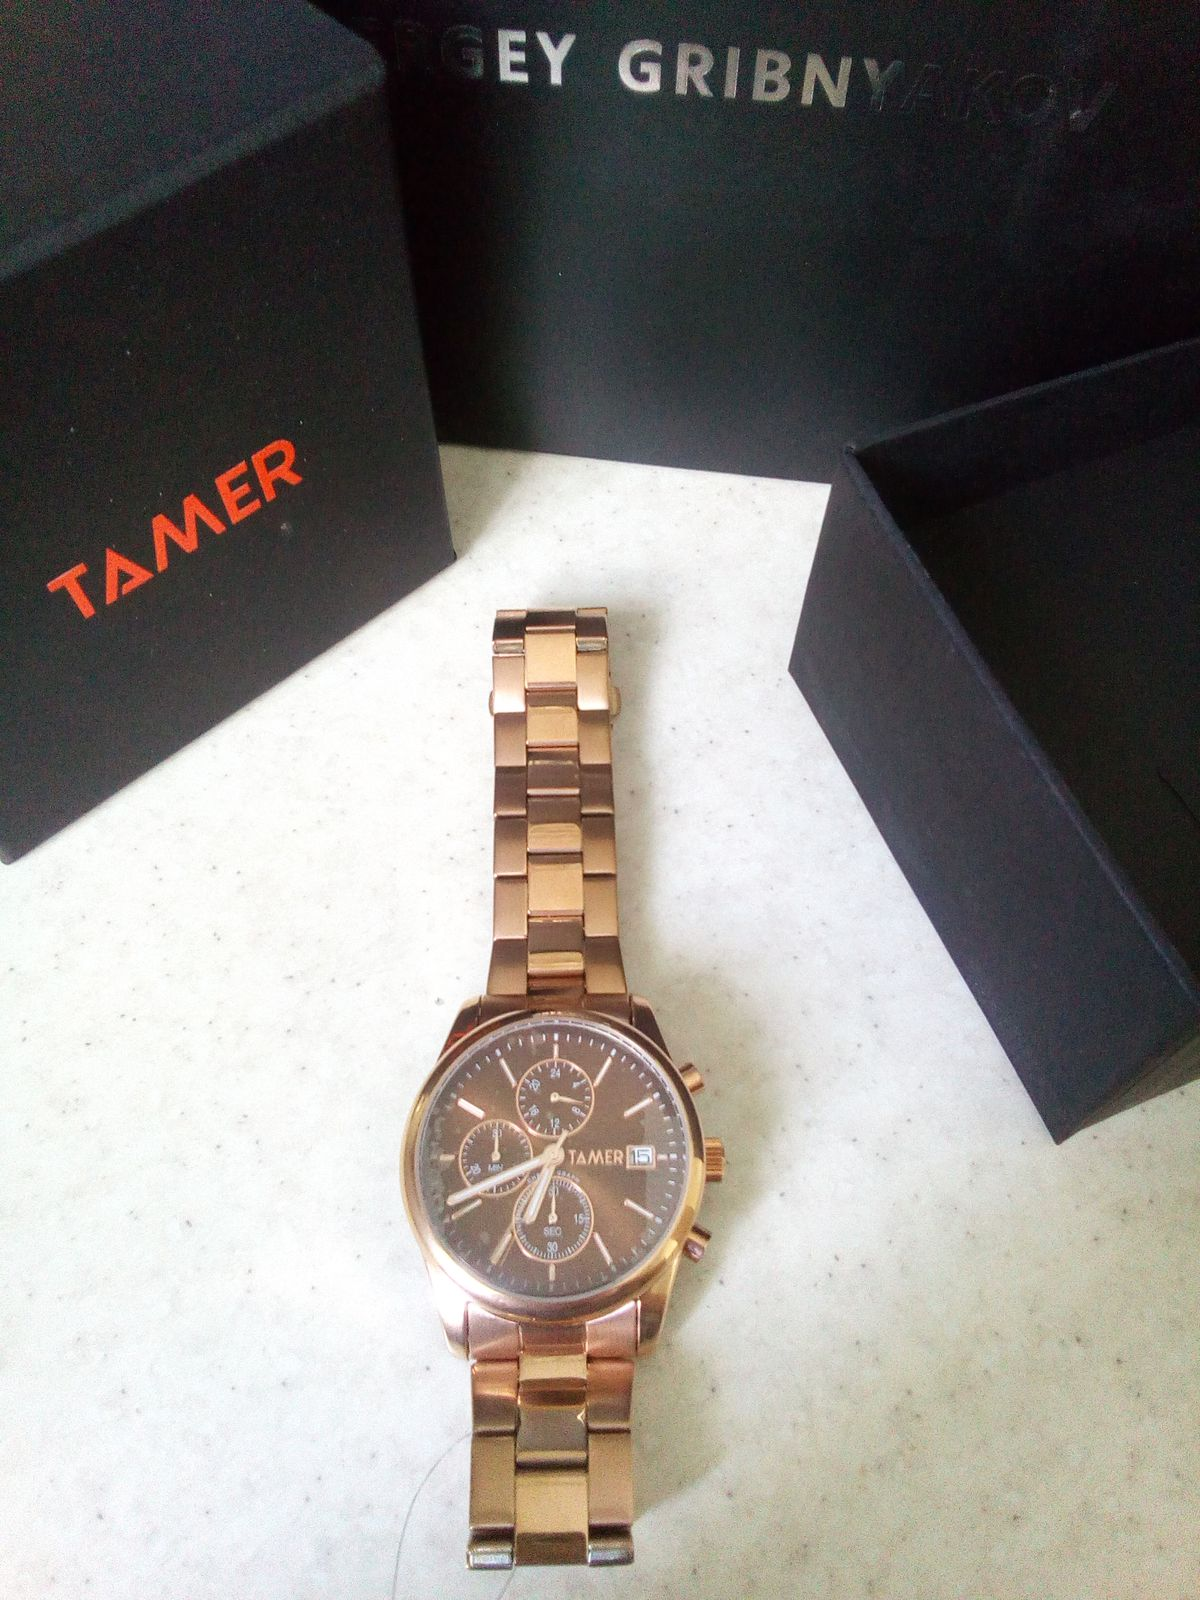 Часы от Sunlight фирмы tamer